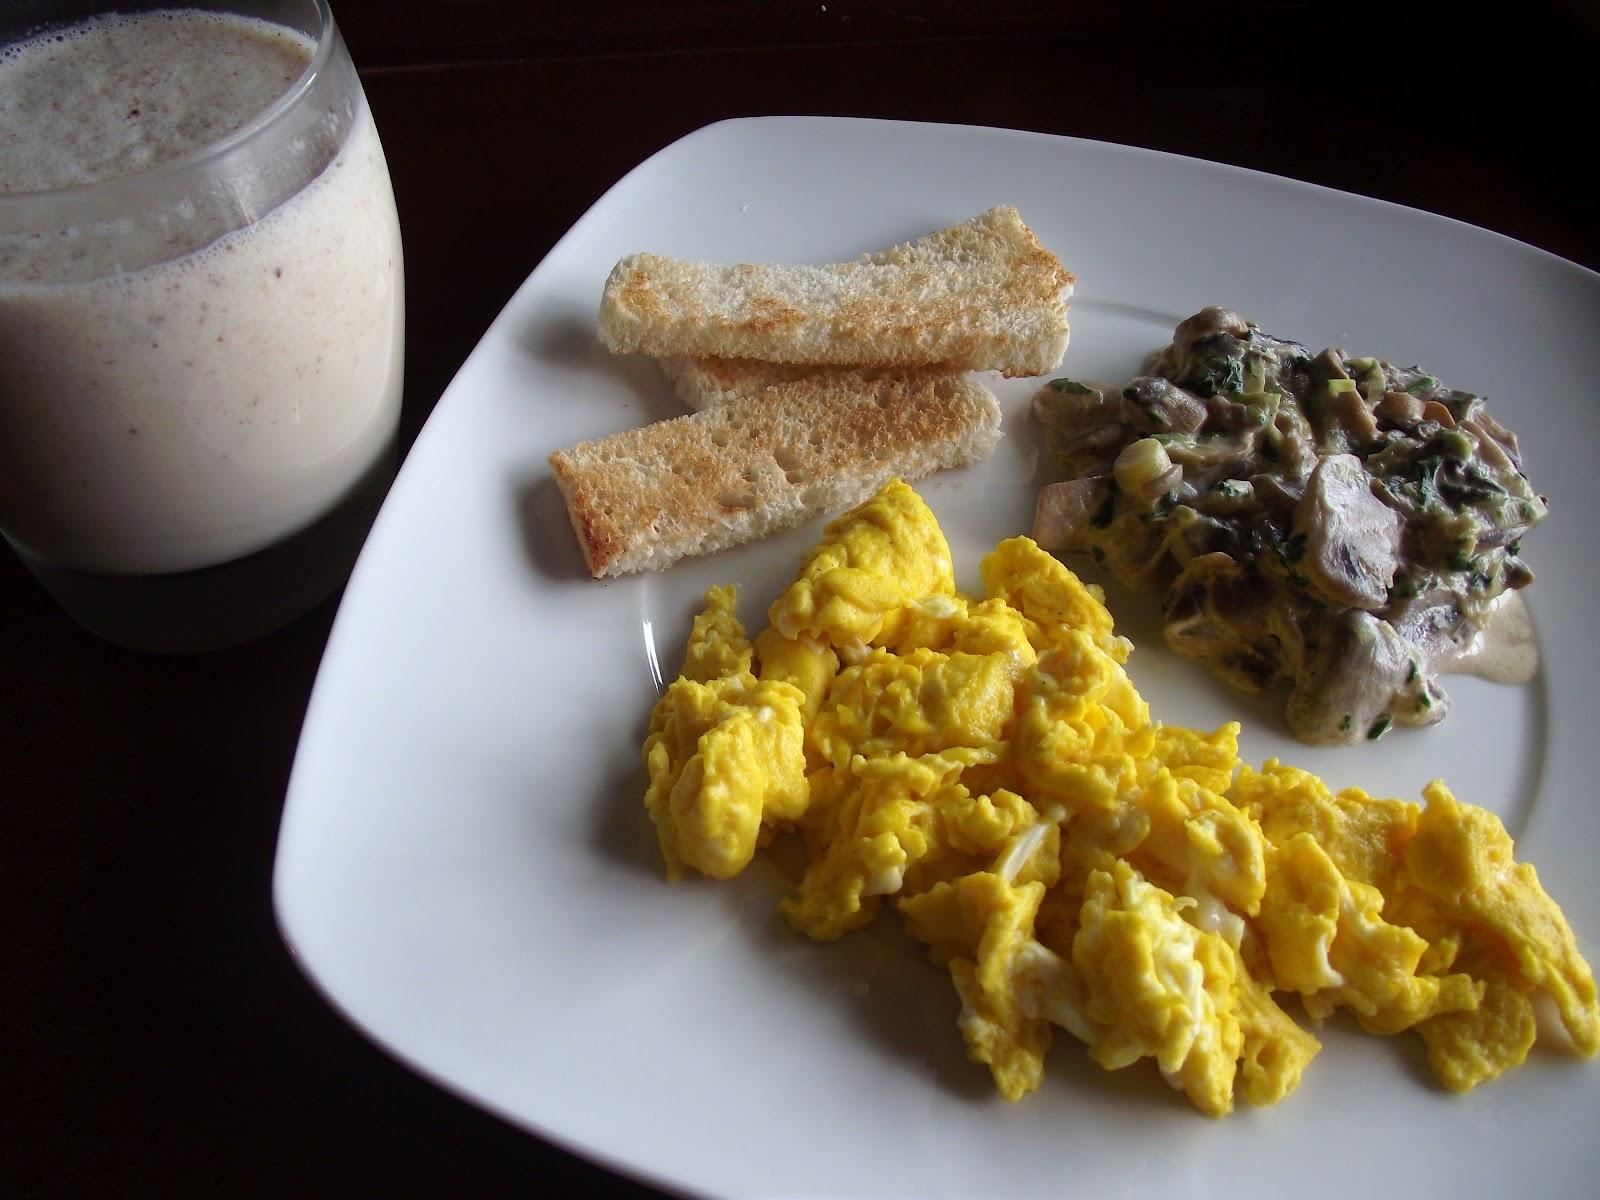 Mimos na comida brunch cogumelos ovos e batido for Ingredientes para comida